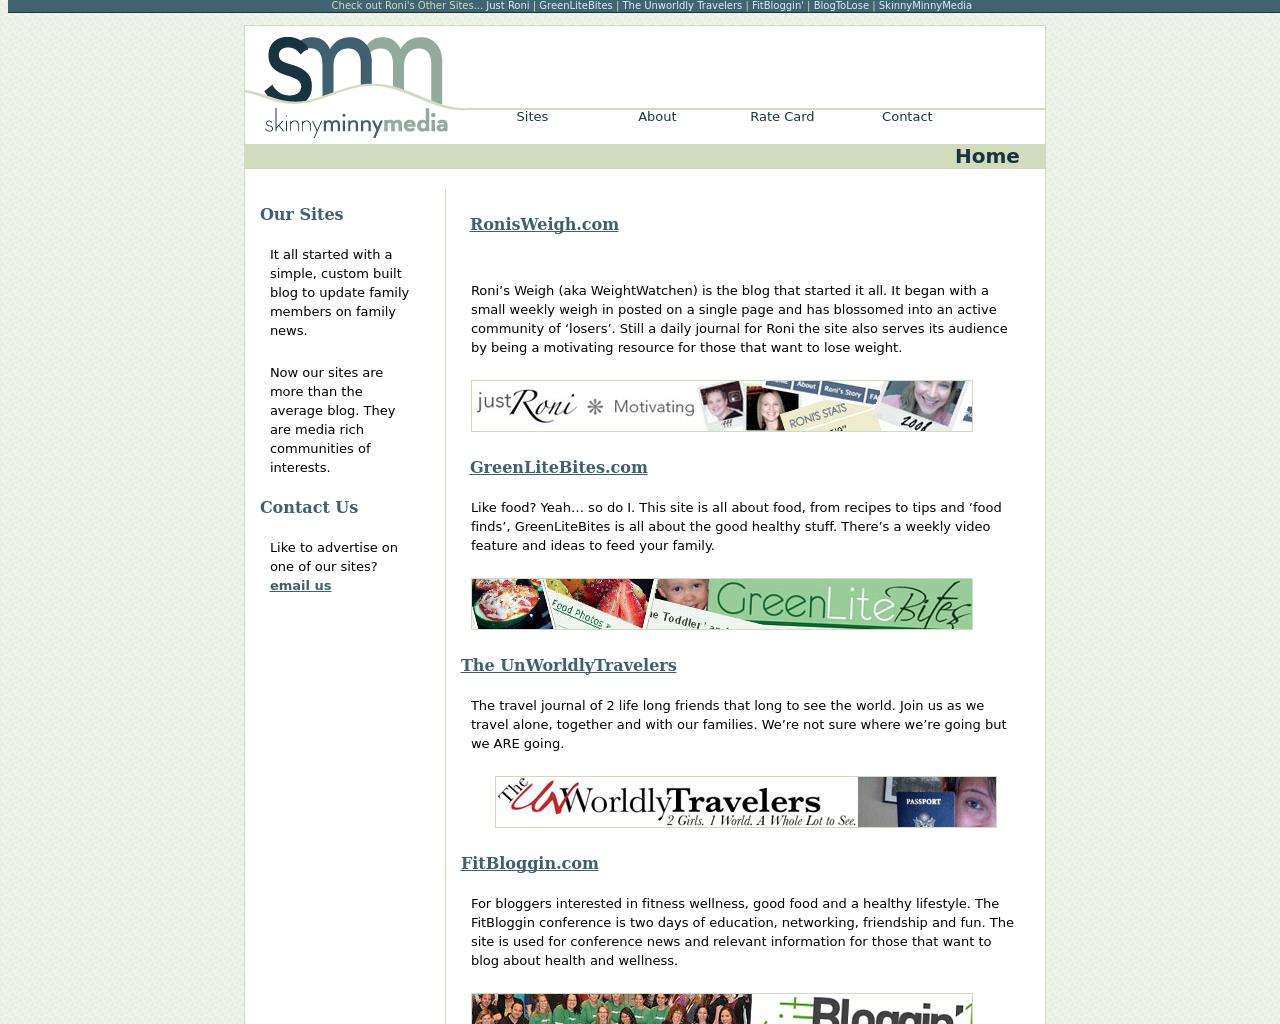 skinnyminnymedia-Advertising-Reviews-Pricing